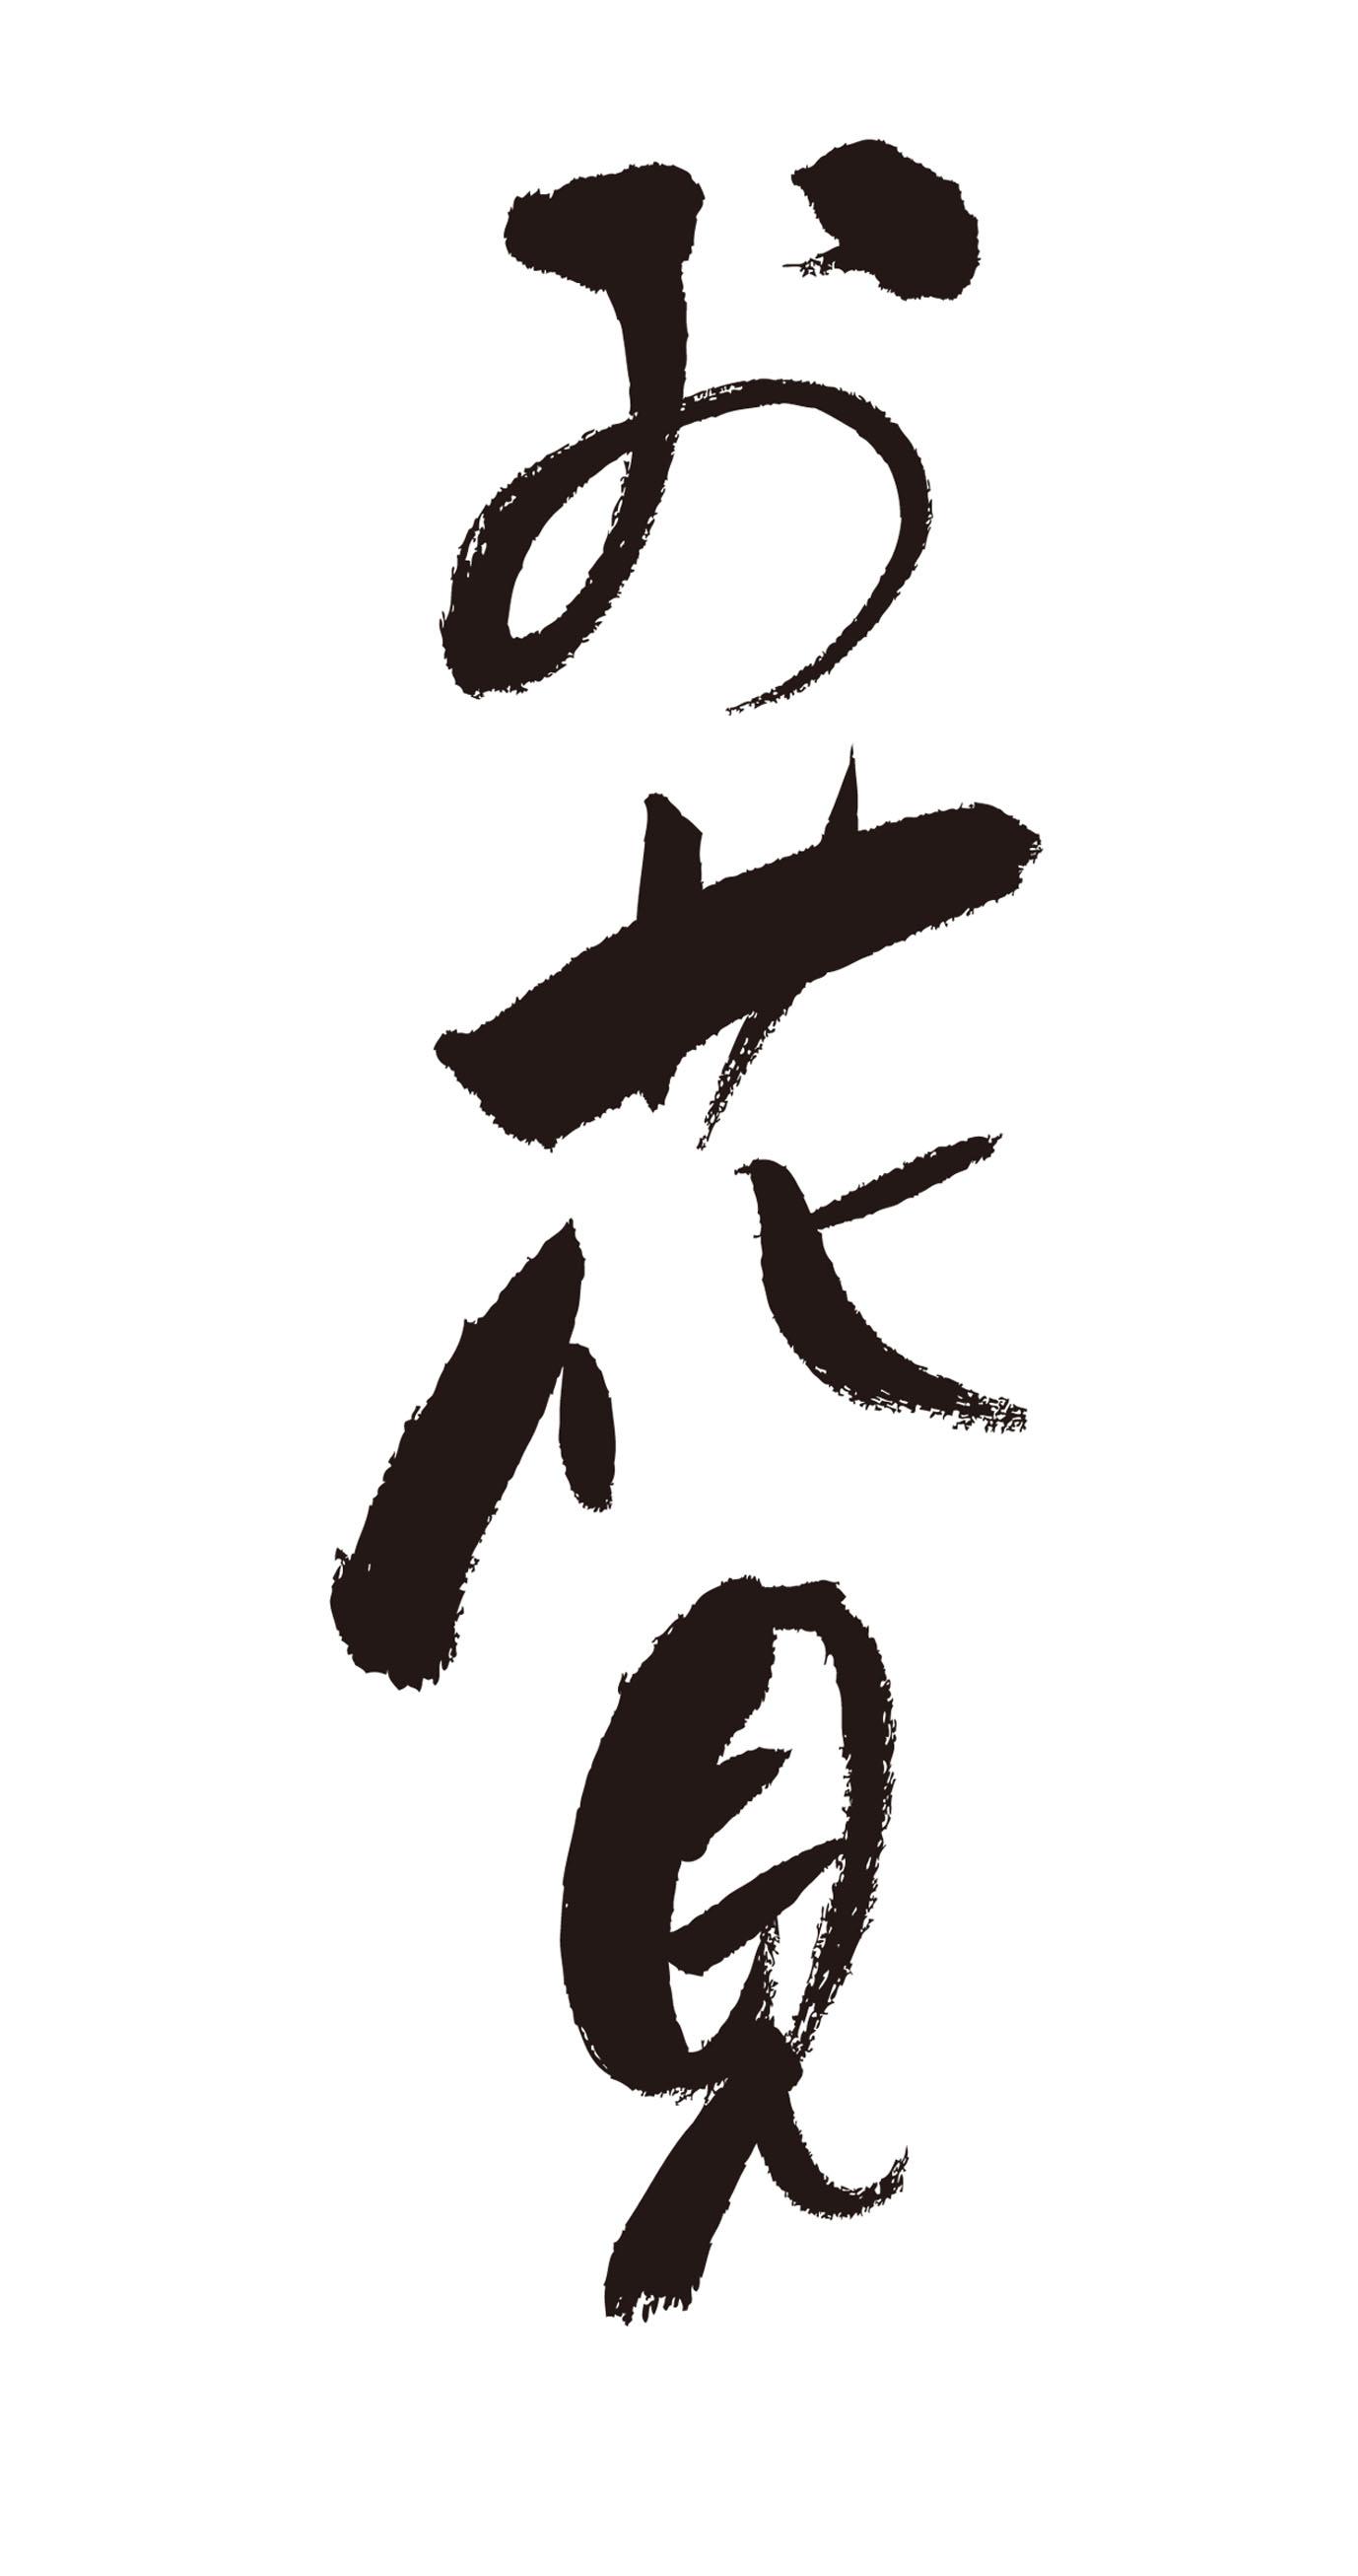 http://shinko-pk.co.jp/blog/hanami-1.jpg